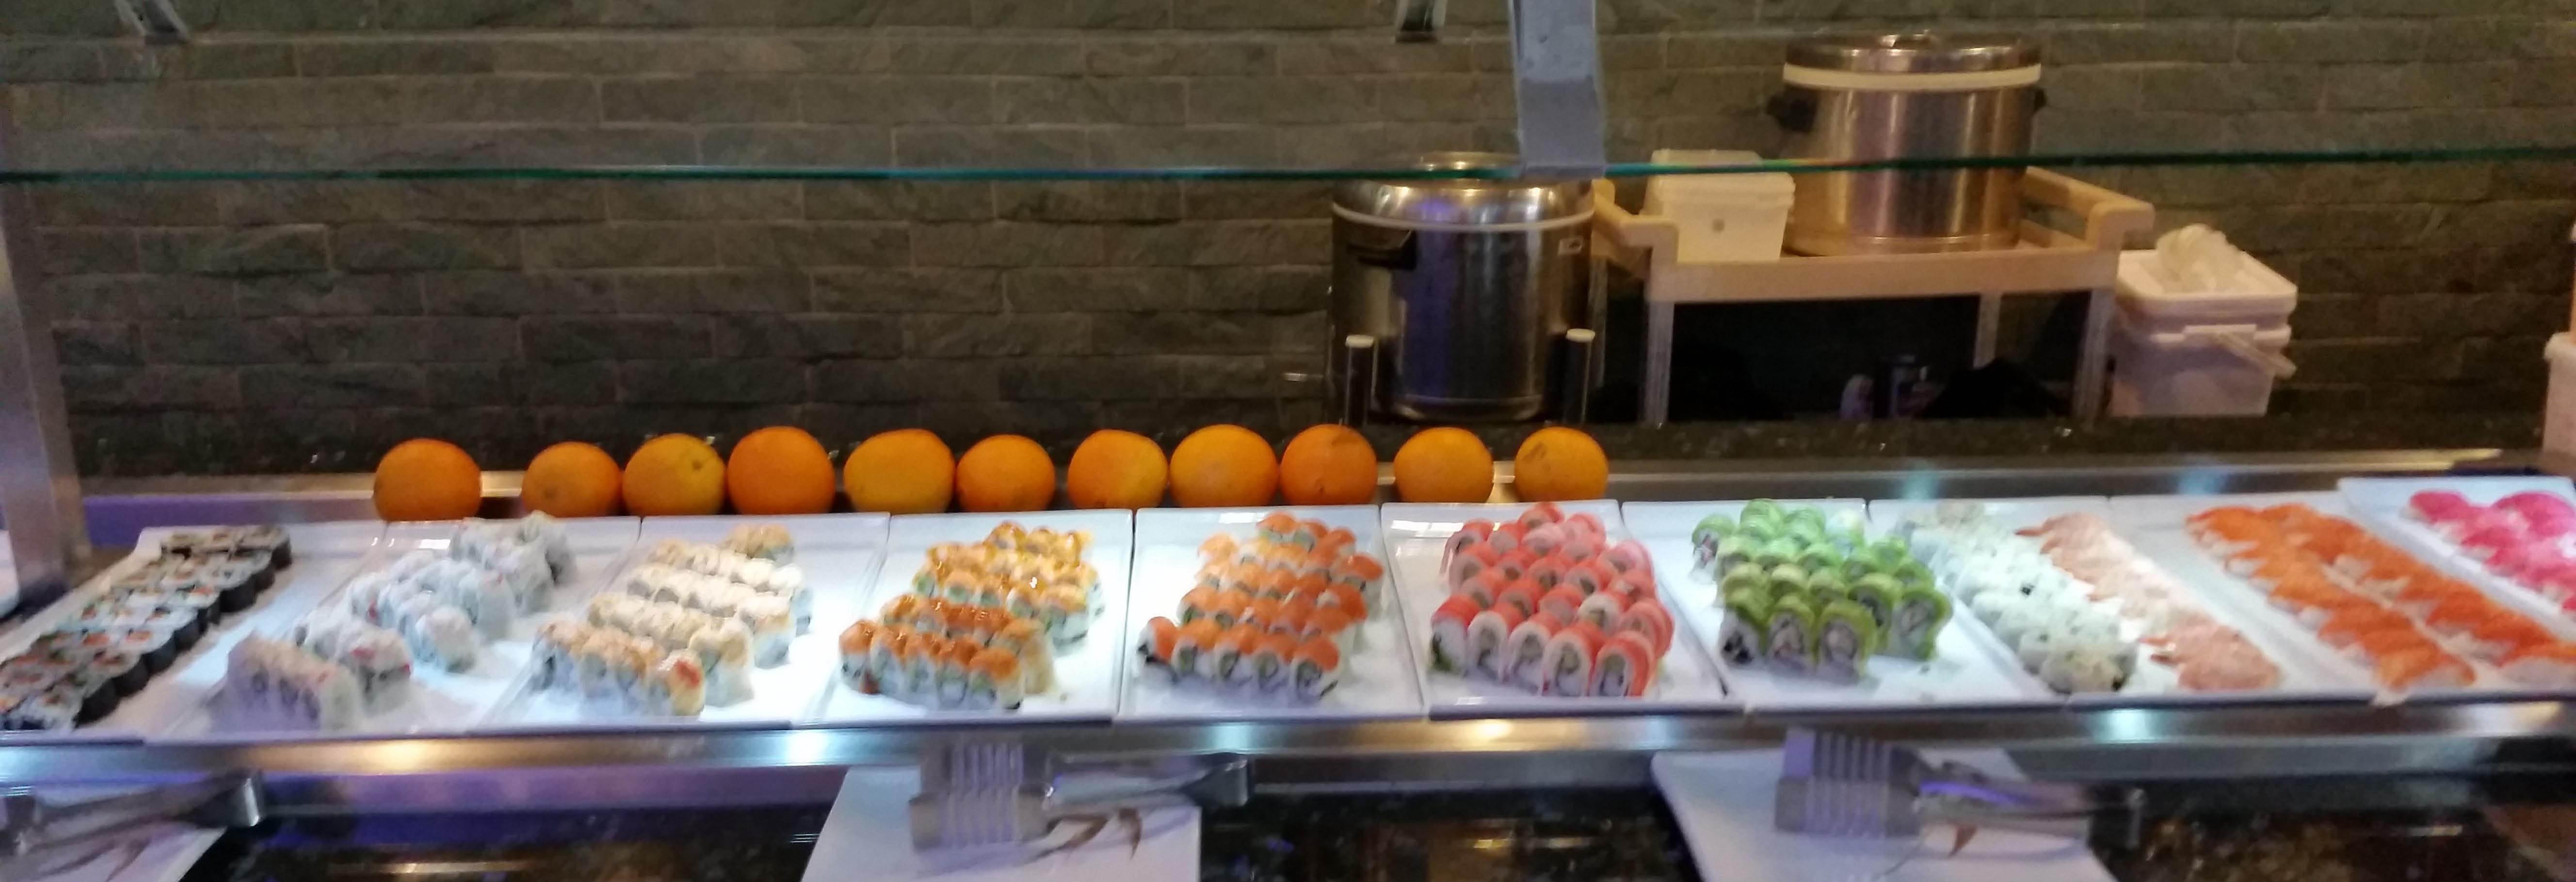 Sushi restaurant near me american food near me foodnow food near me